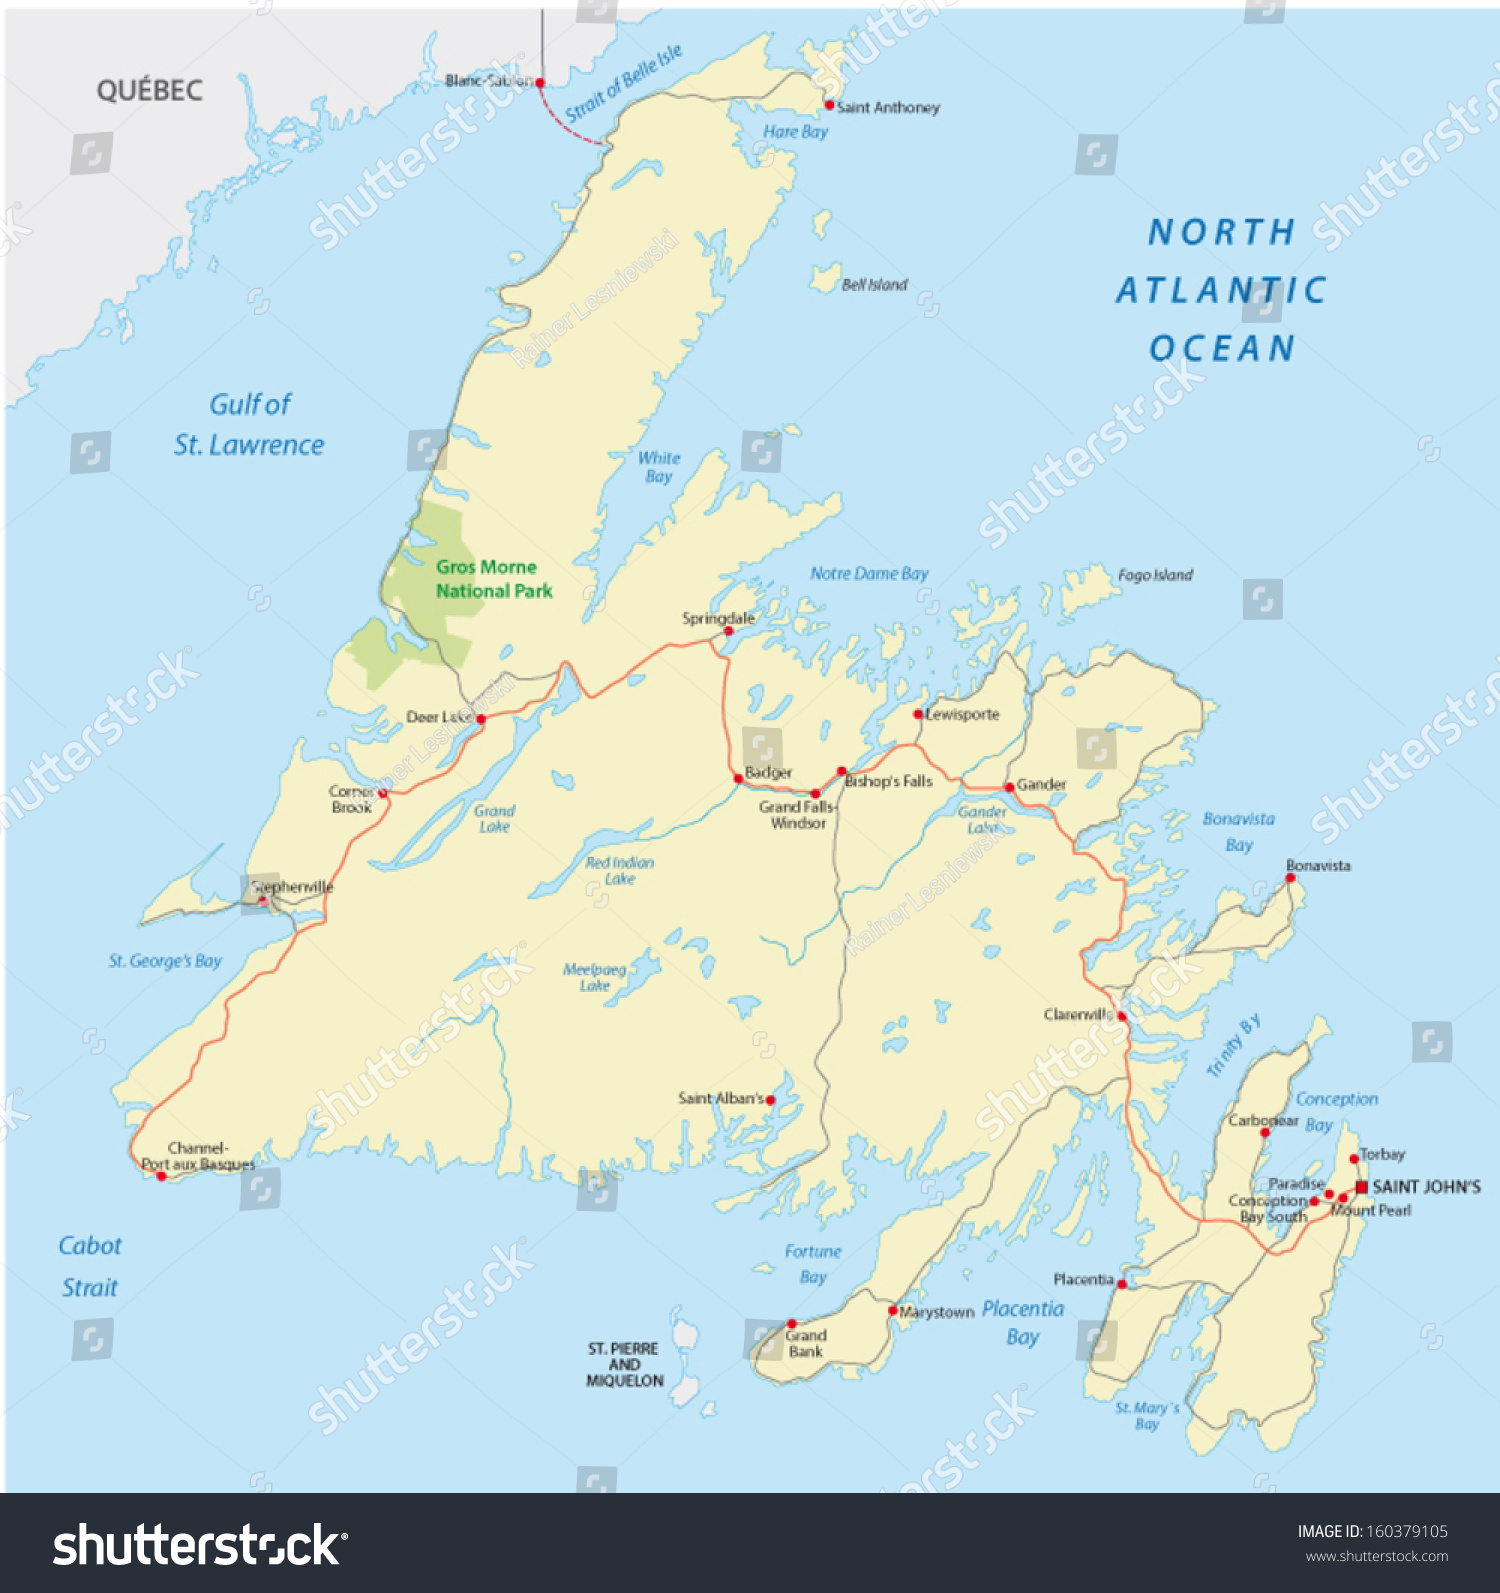 Newfoundland Road Map Stock Vector 160379105 - Shutterstock on canada map, laurentian mountains map, nova scotia map, alberta map, new brunswick map, yucatan peninsula map, quebec map, europe map, hispaniola map, hudson bay map, iceland map, manitoba map, bahamas map, avalon peninsula map, new mexico map, british columbia map, north america map, world map, labrador map, greenland map,